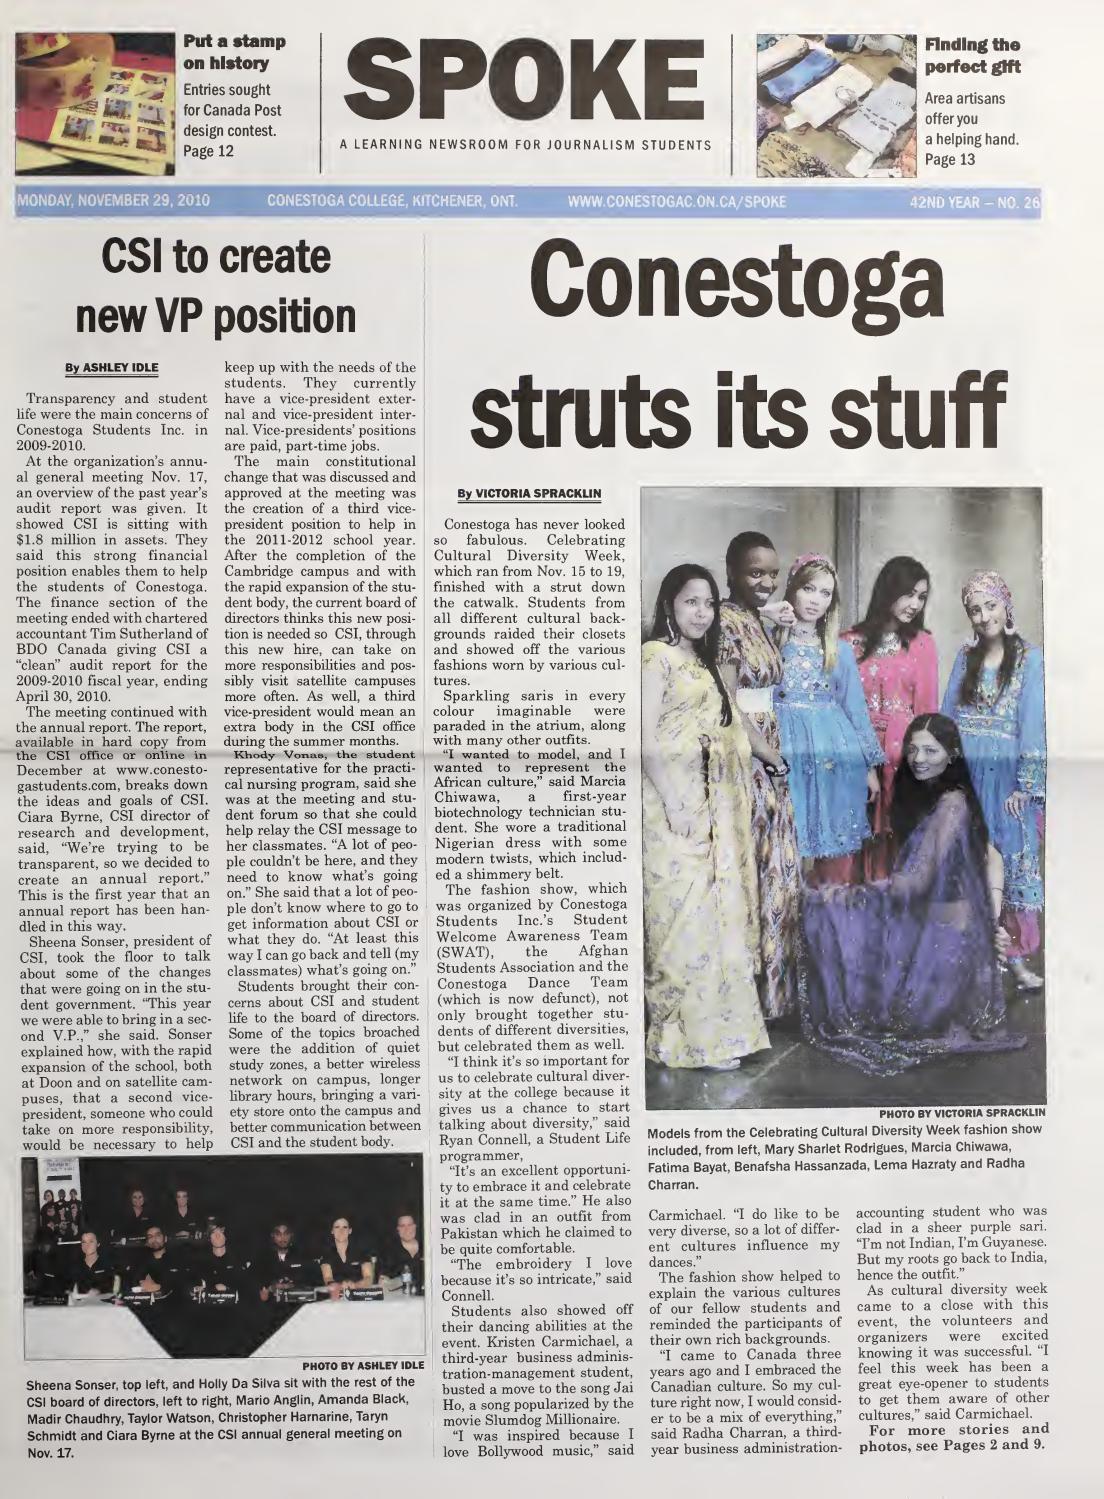 Digital Edition - November 29, 2010 by SPOKENewspaper - issuu